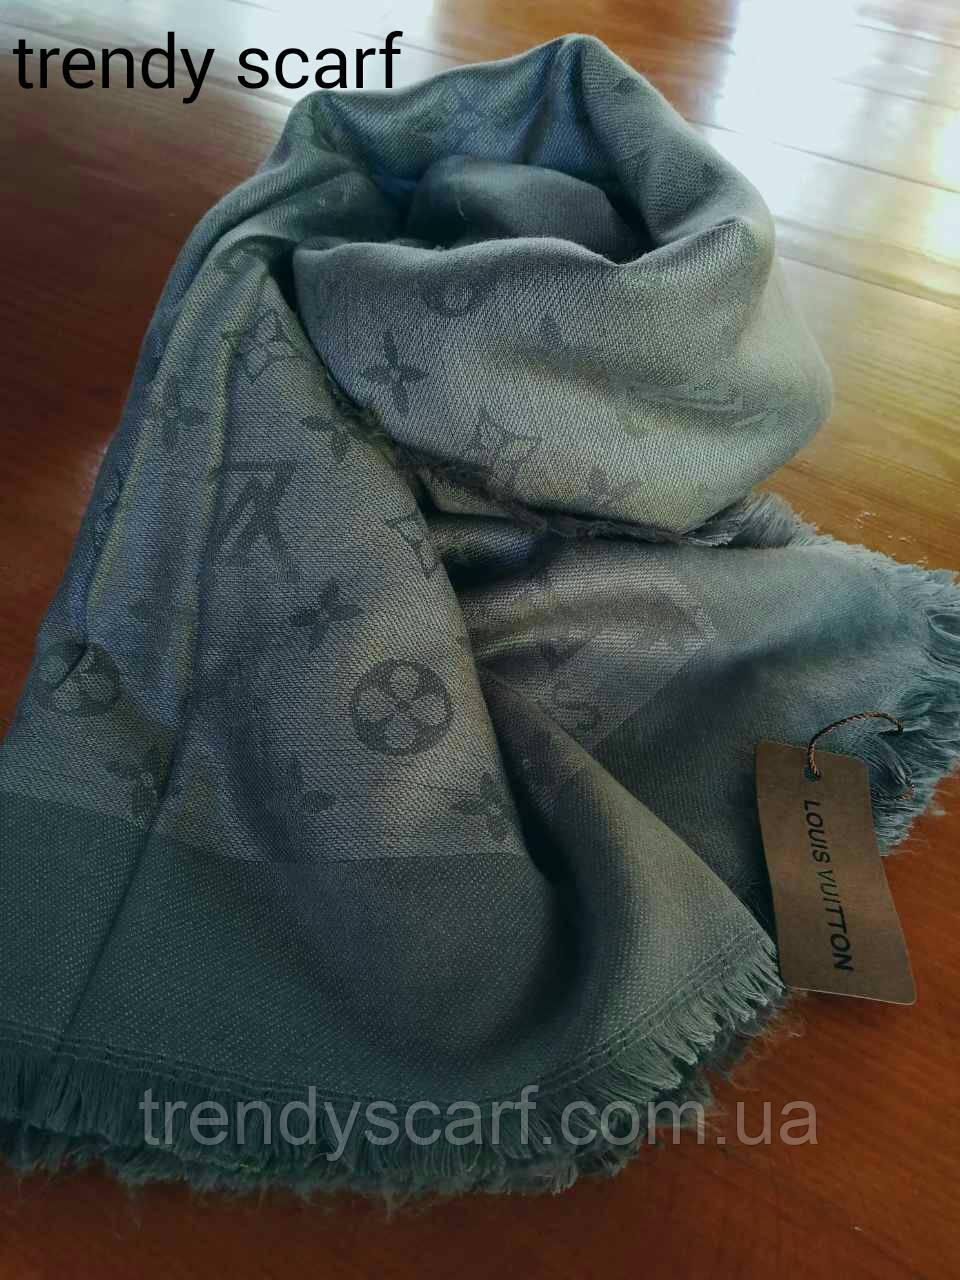 Женский Платок Louis Vuitton бренд Луи Виттон серый цвет monogram реплика  шерсть шелк 140 150 4c4f47f05b2